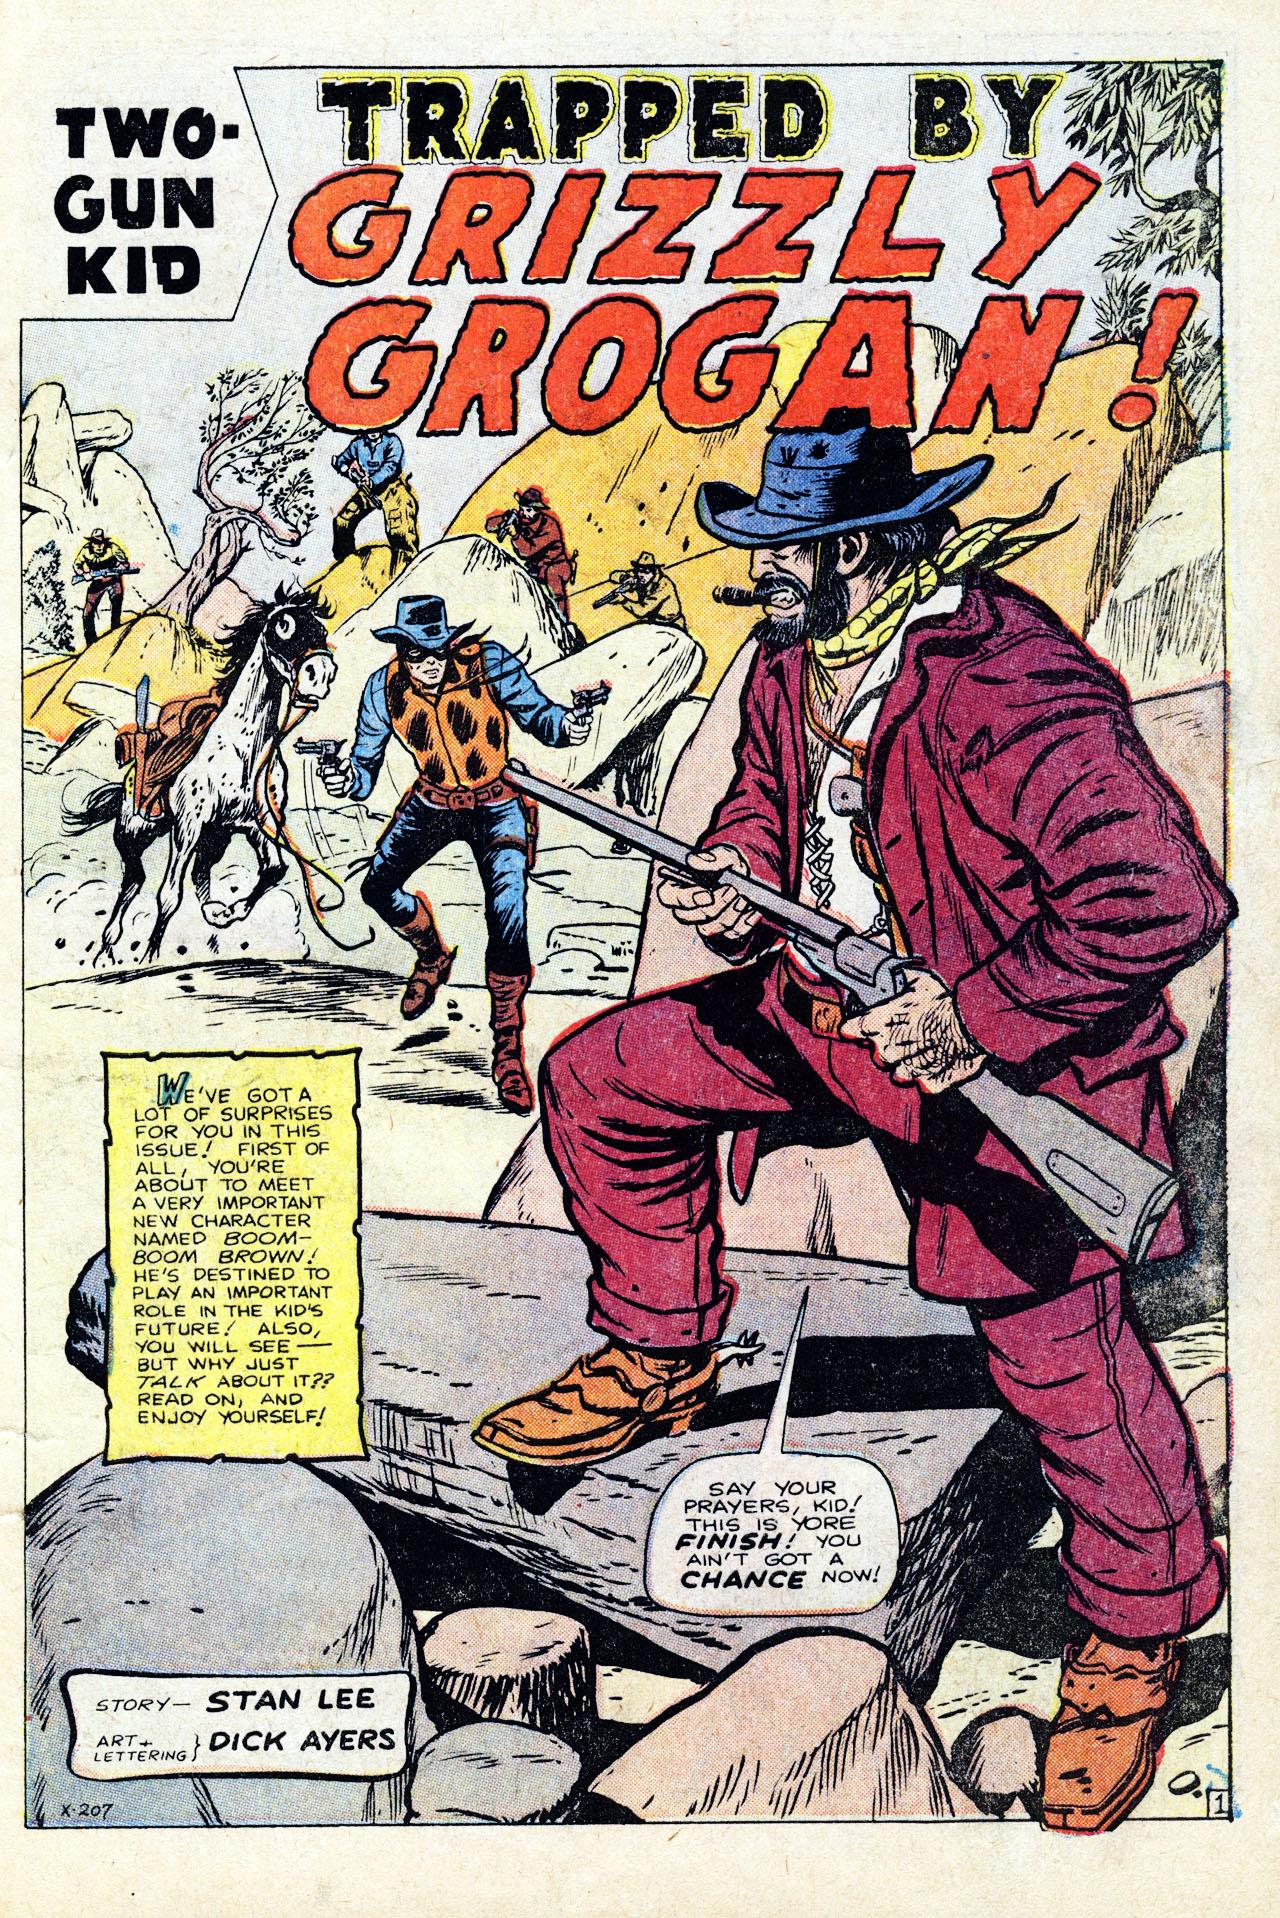 Read online Two-Gun Kid comic -  Issue #64 - 3